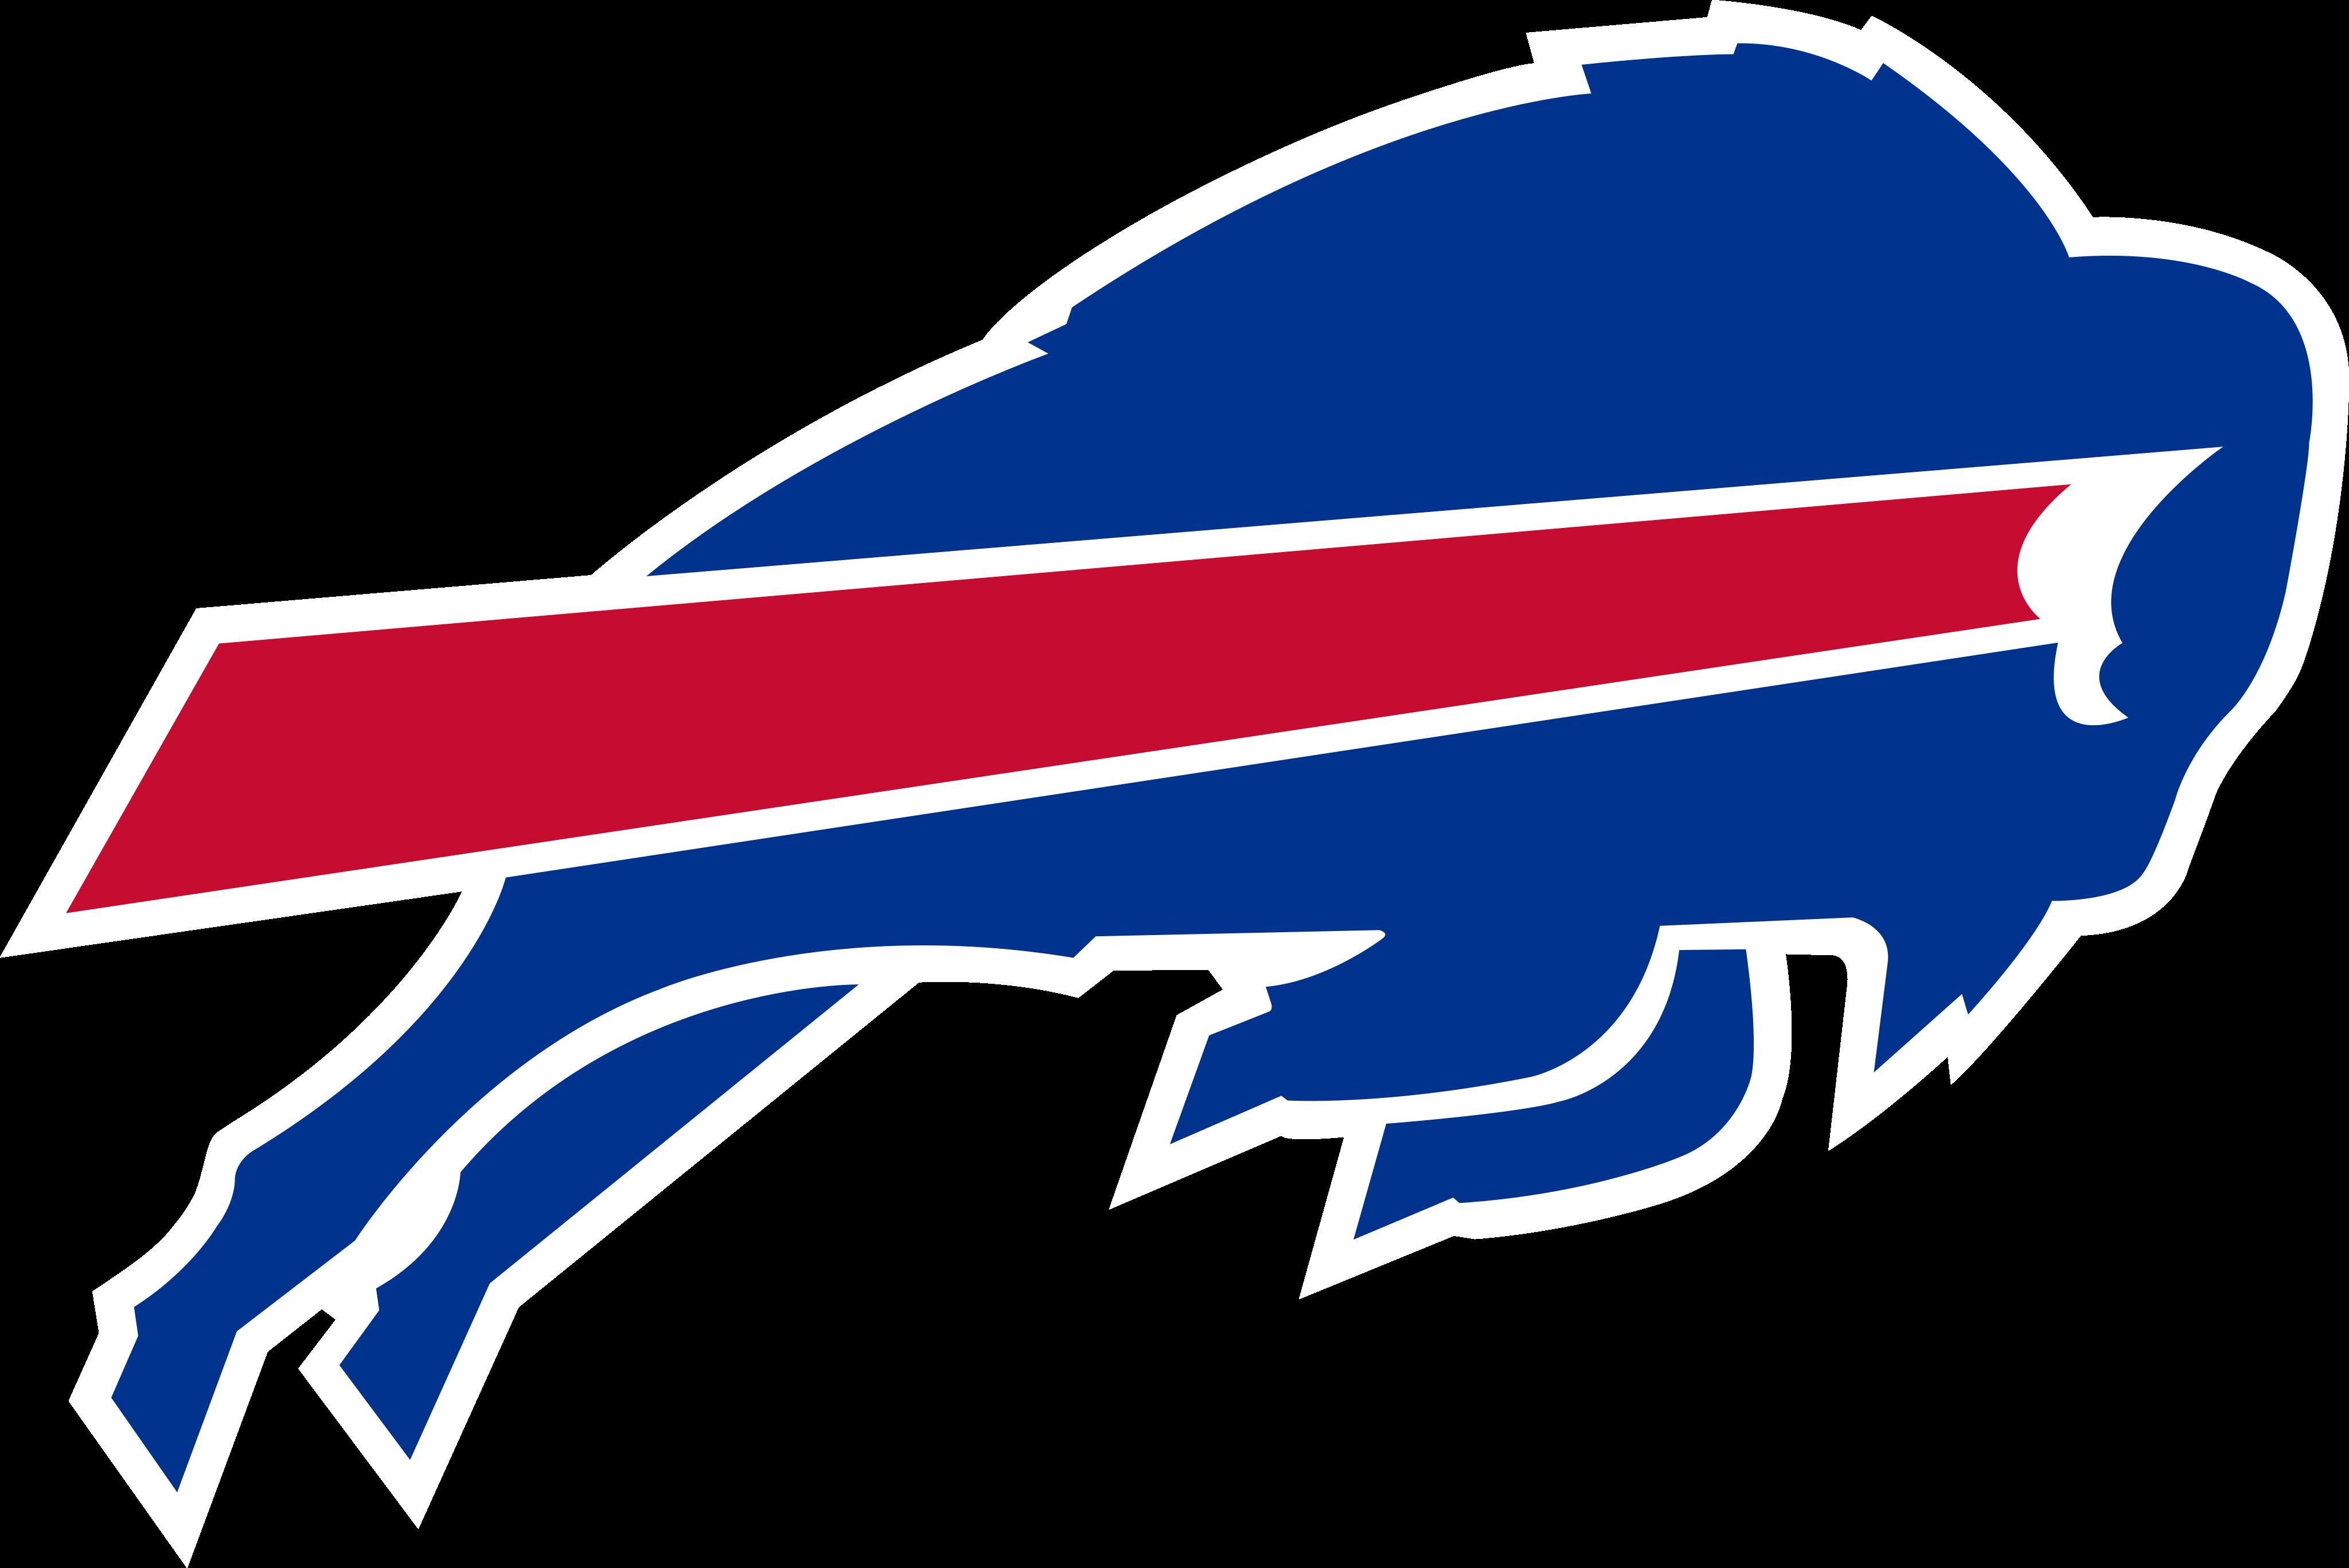 buffalo bills logo - Buffalo Bills Logo